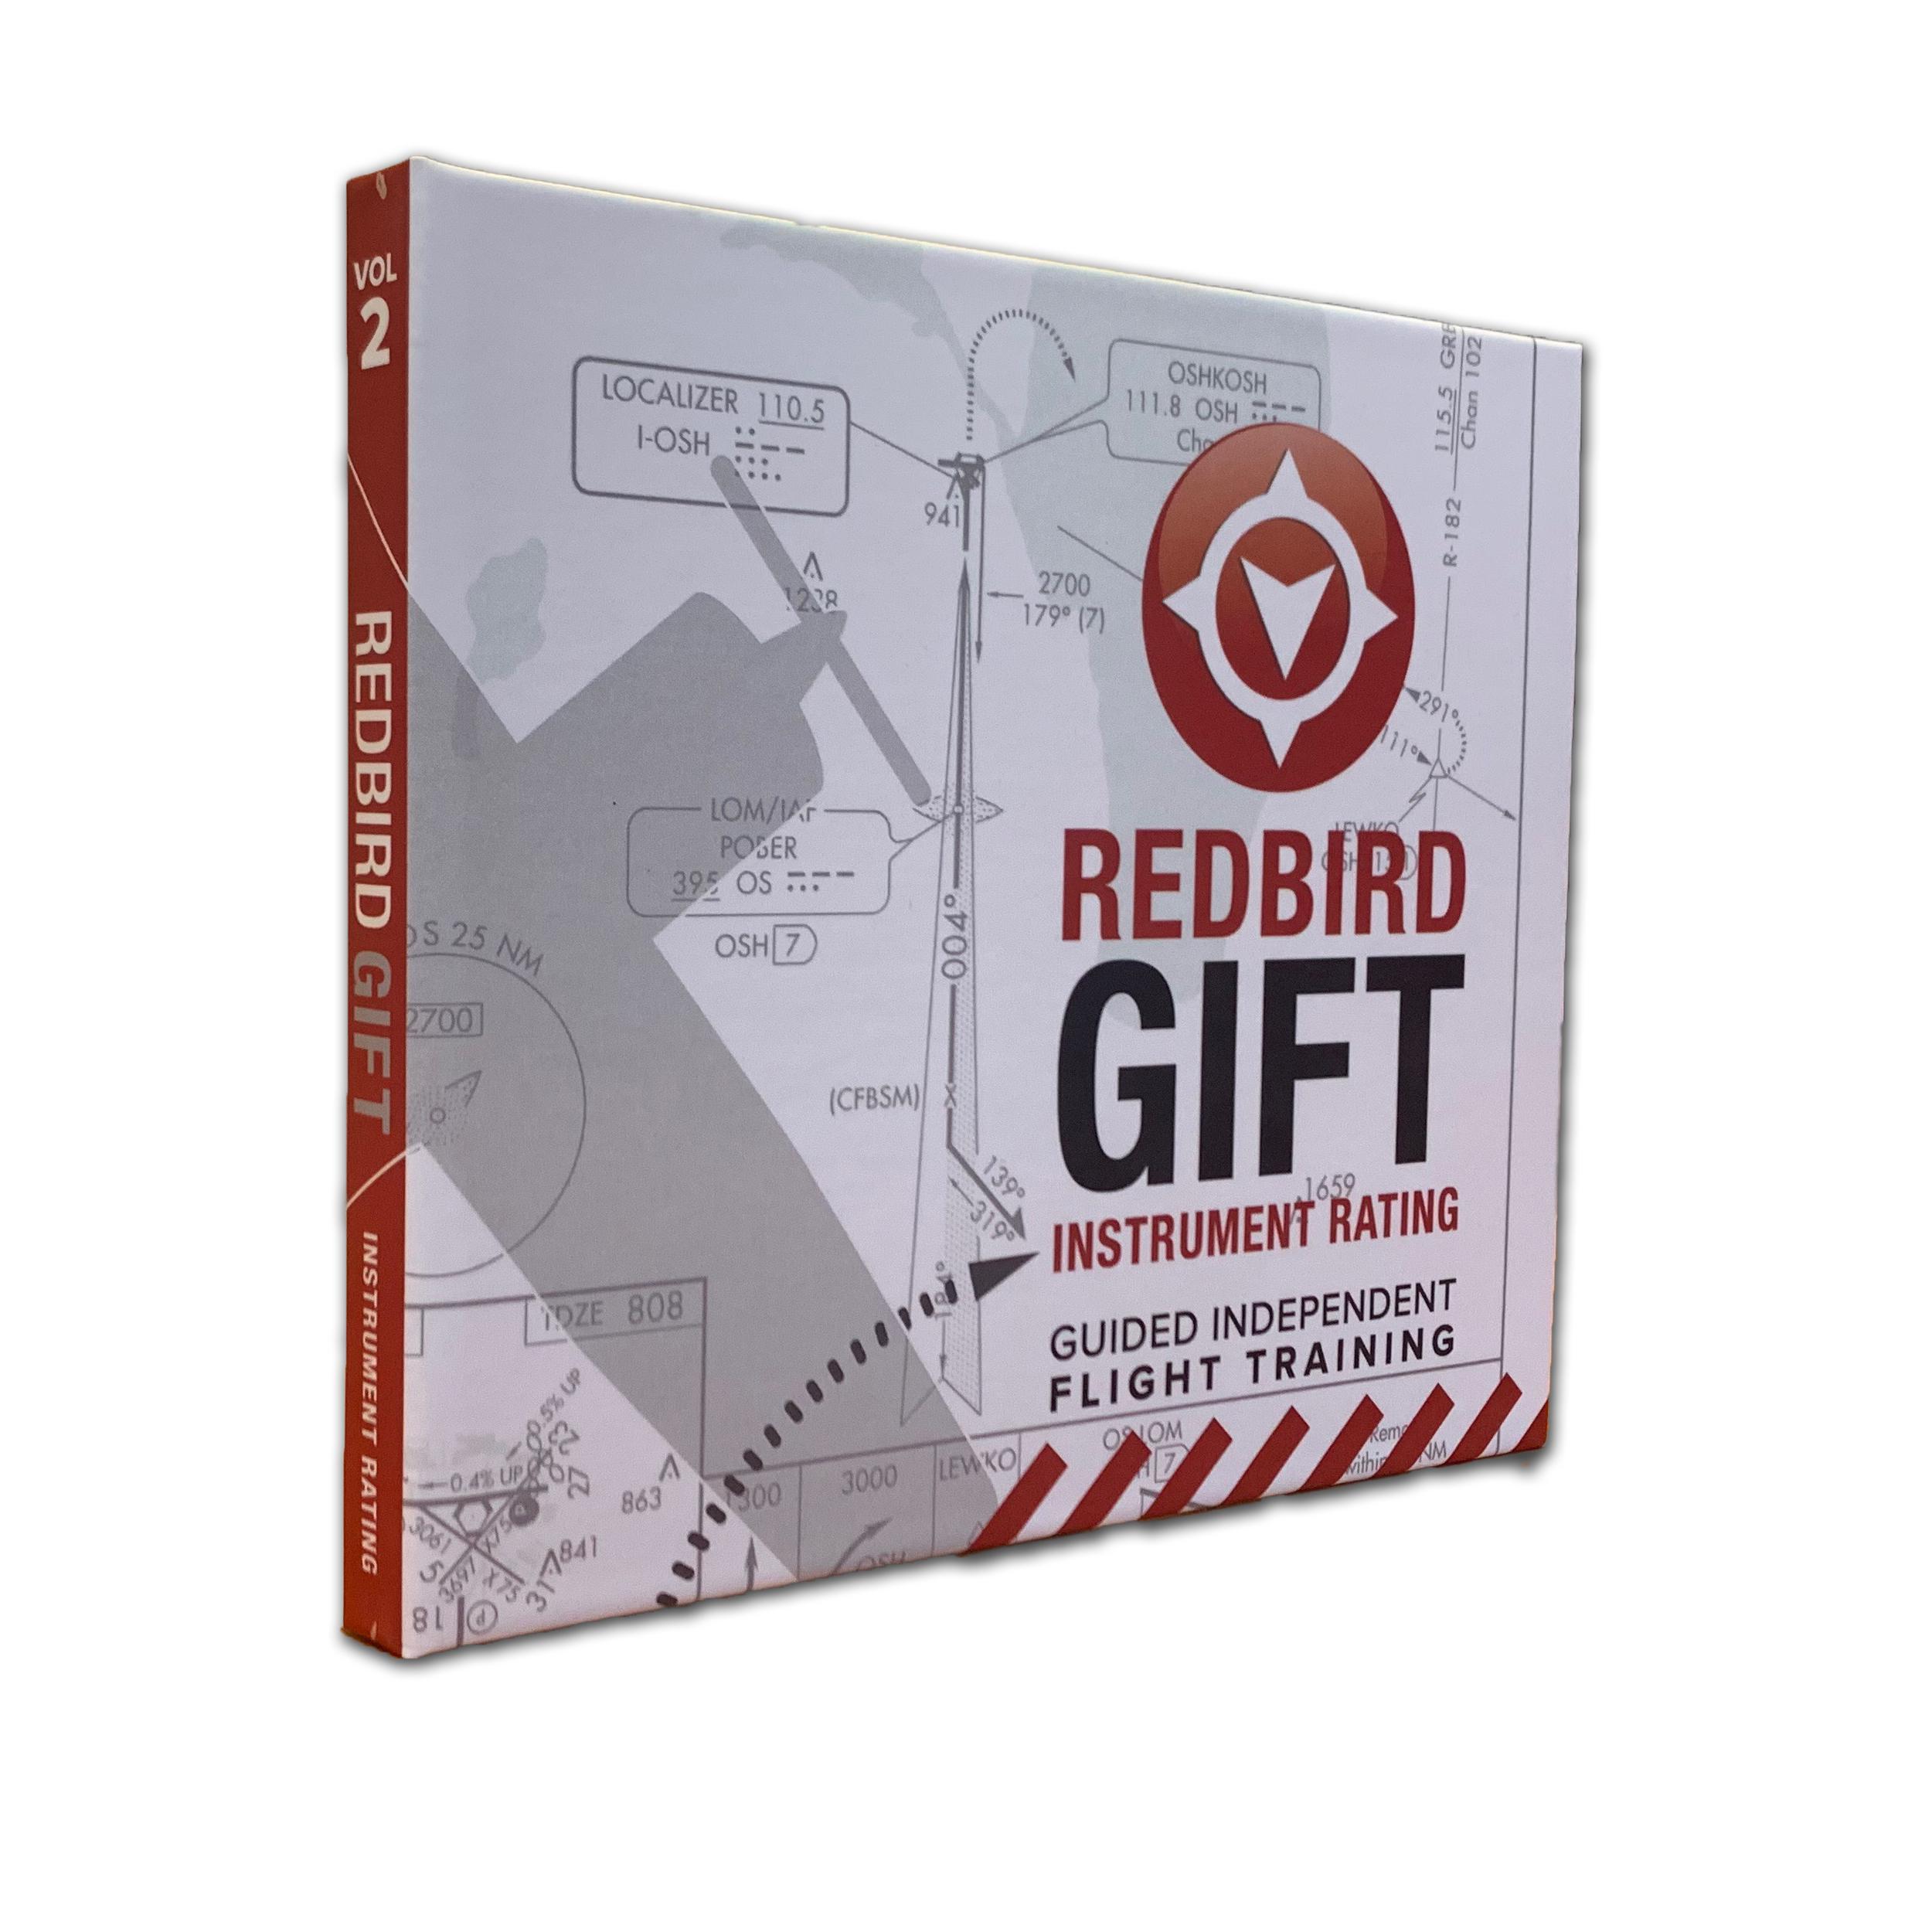 Redbird Flight Launches GIFT Instrument Rating